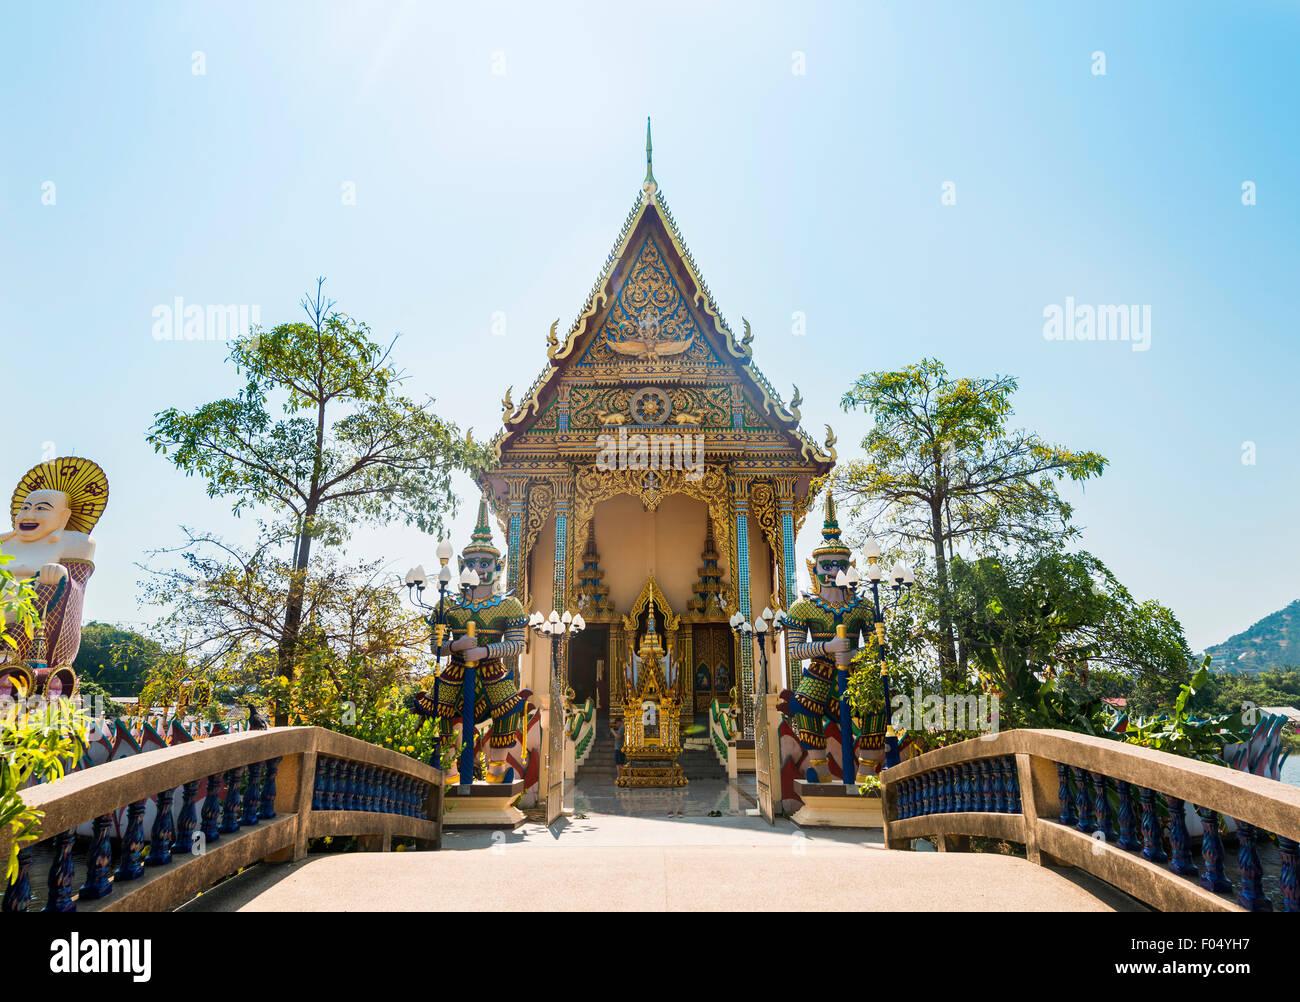 Wat Plai Laem Temple in Ban Bo Phut, Ko Samui, Thailand Stock Photo